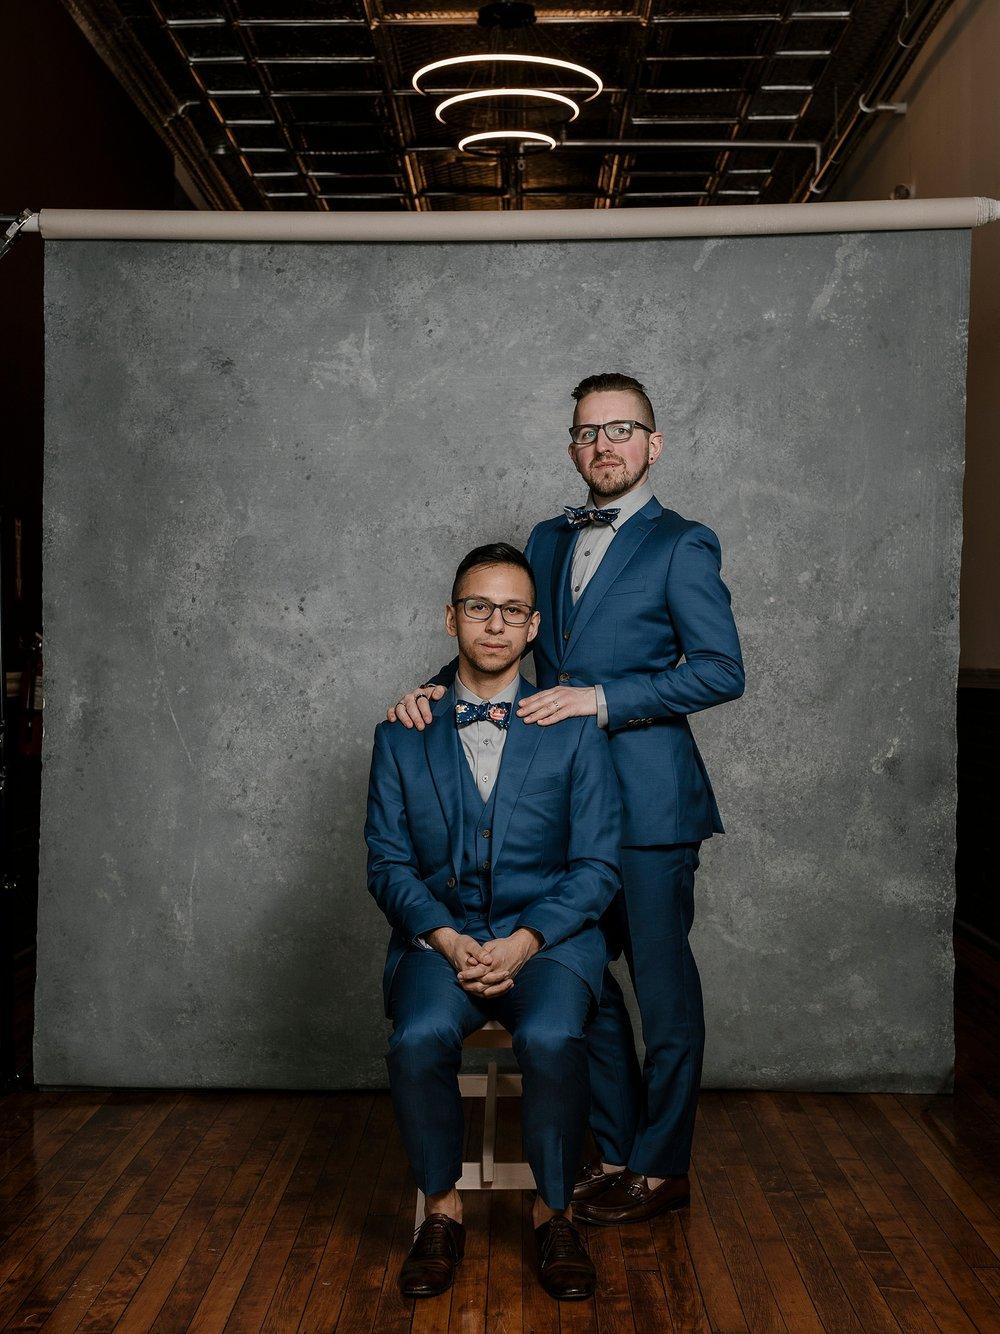 Joe_Mac_Creative_Philadelphia_Philly_LGBT_Gay_Engagement_Wedding_Photography__0092.jpg